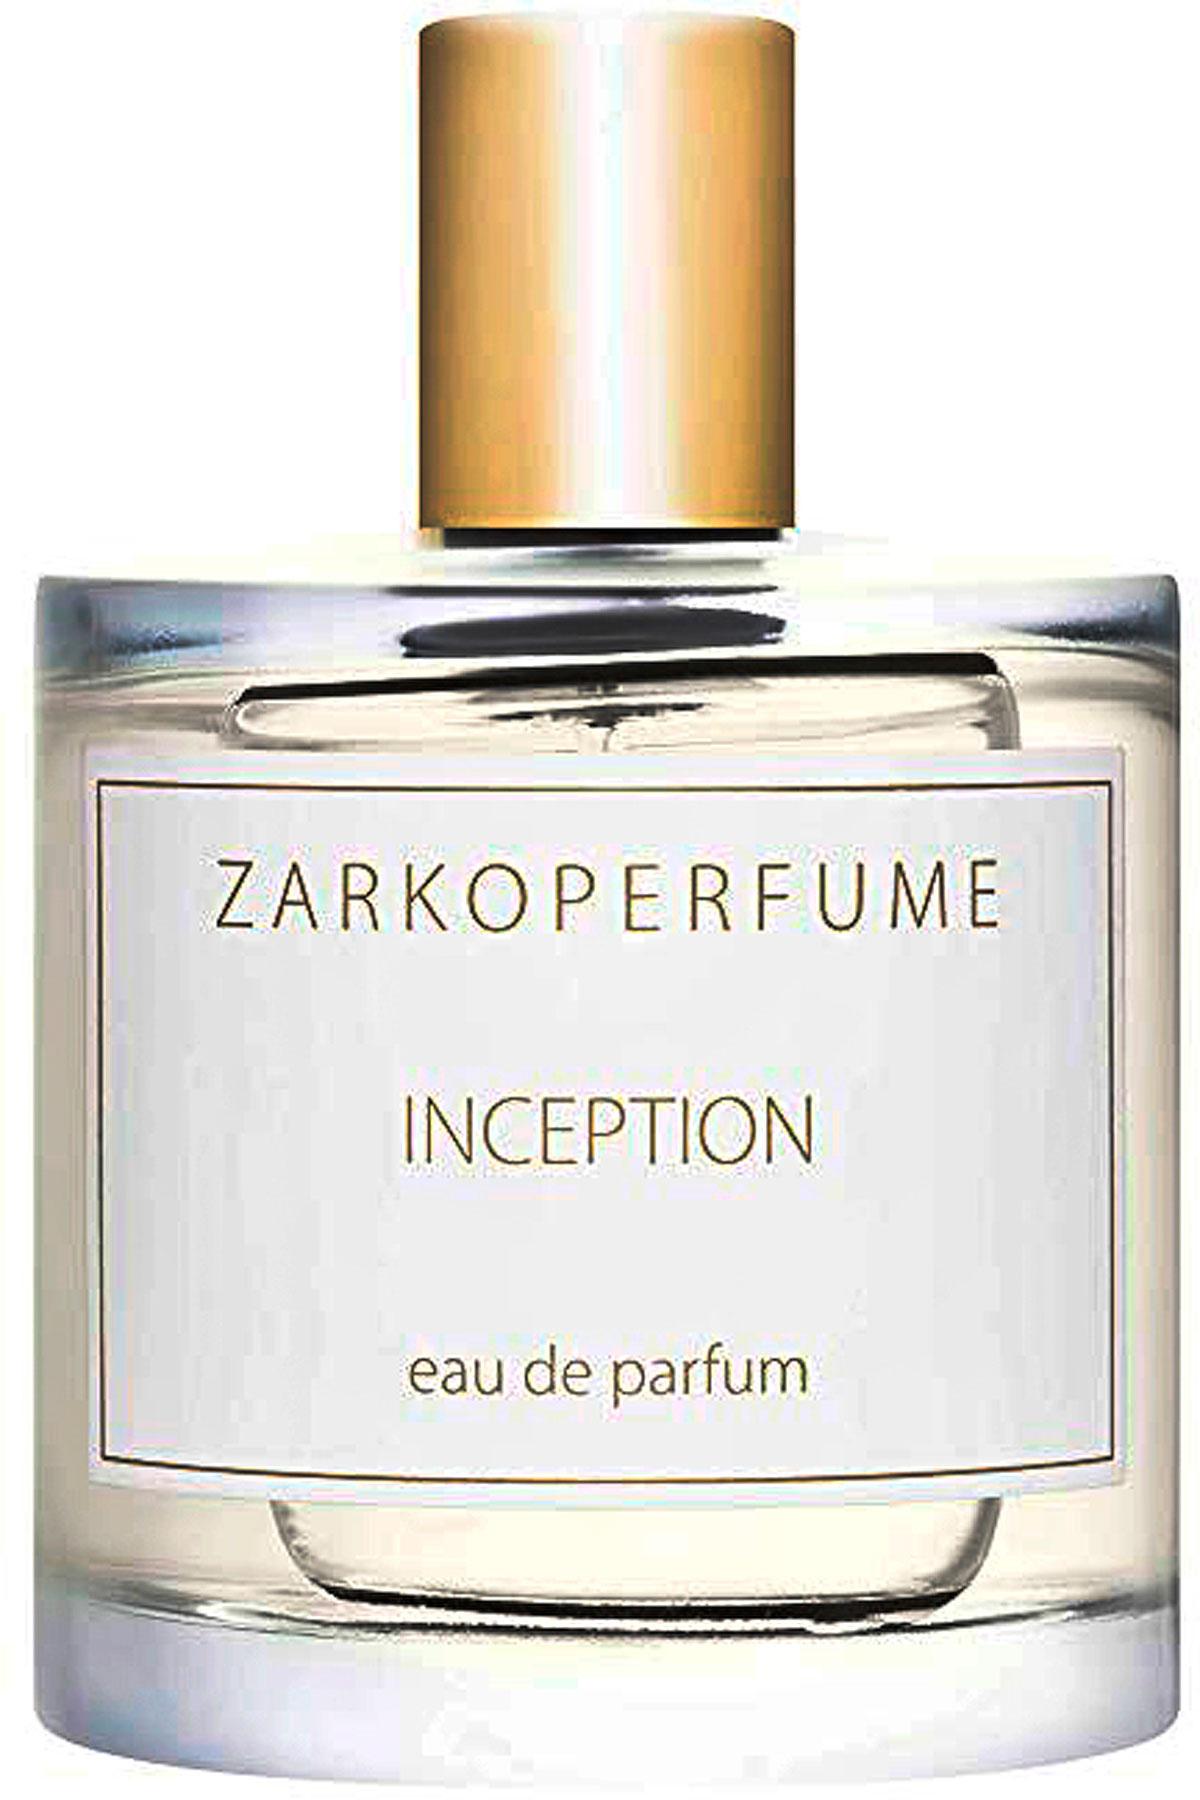 Zarkoperfume Fragrances for Women, Inception - Eau De Parfum - 100 Ml, 2019, 100 ml